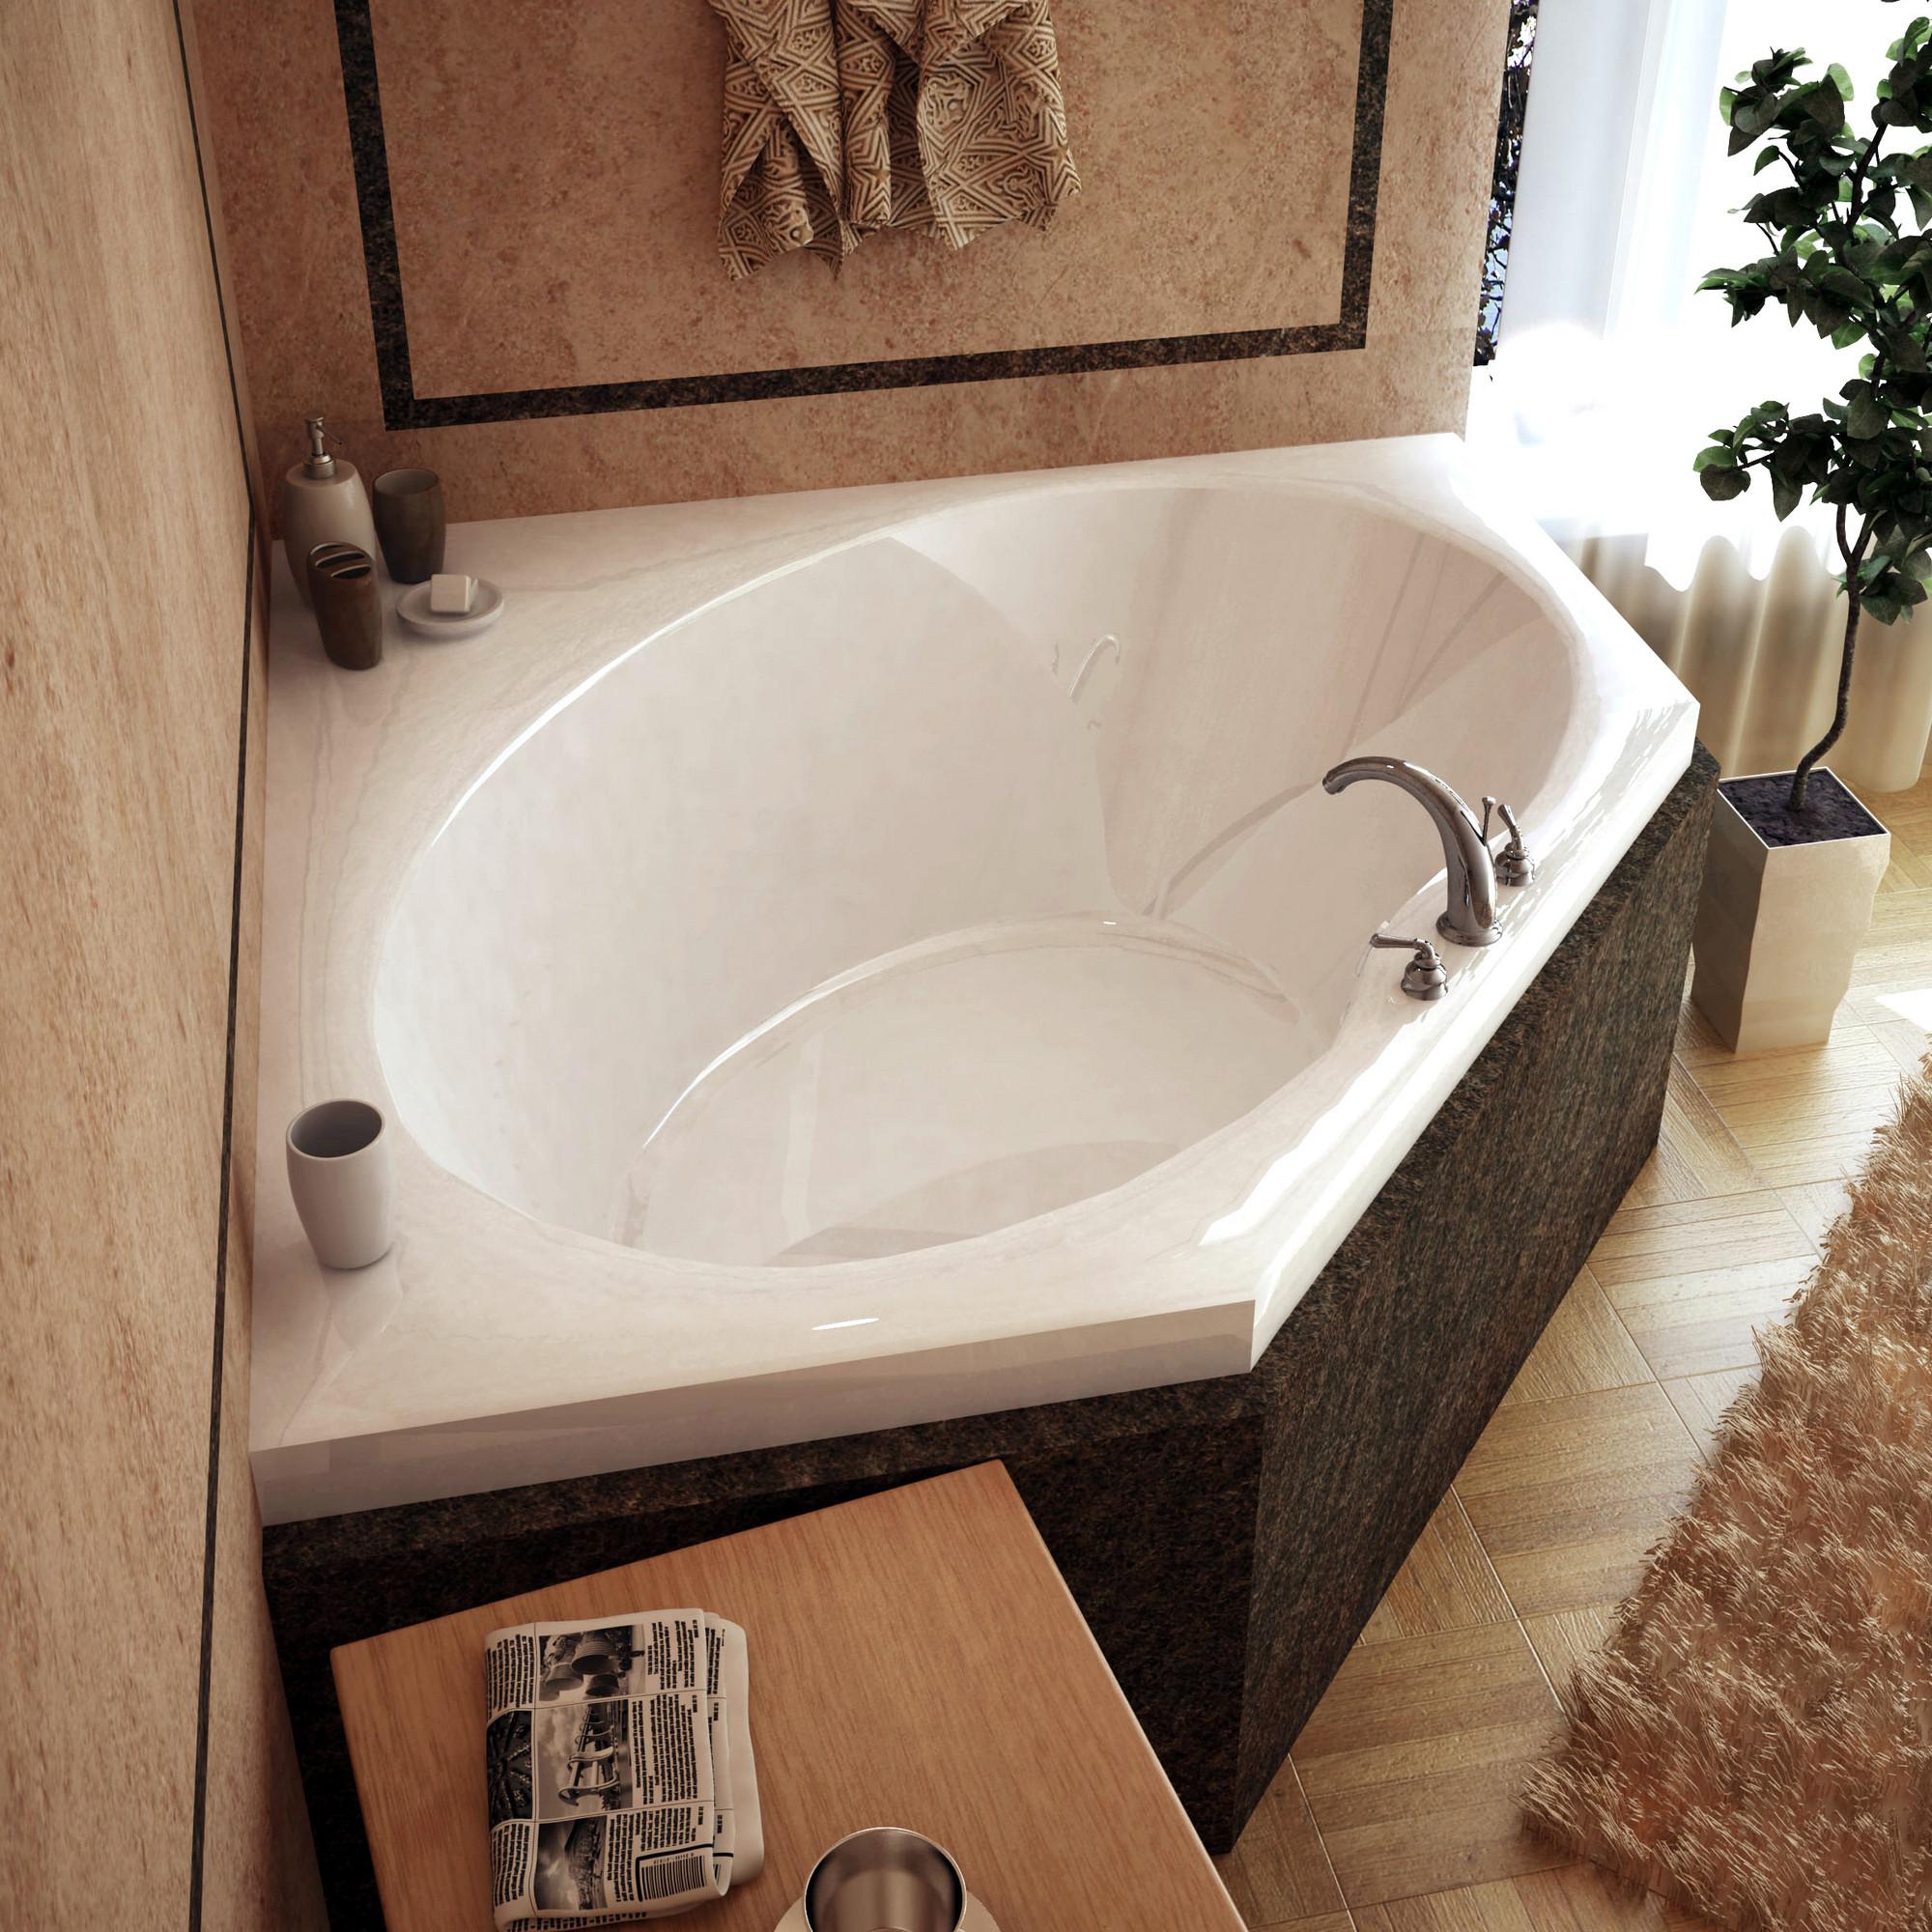 MediTub 6060V Atlantis Venus 60 x 60 Corner Acrylic Soaking Bathtub